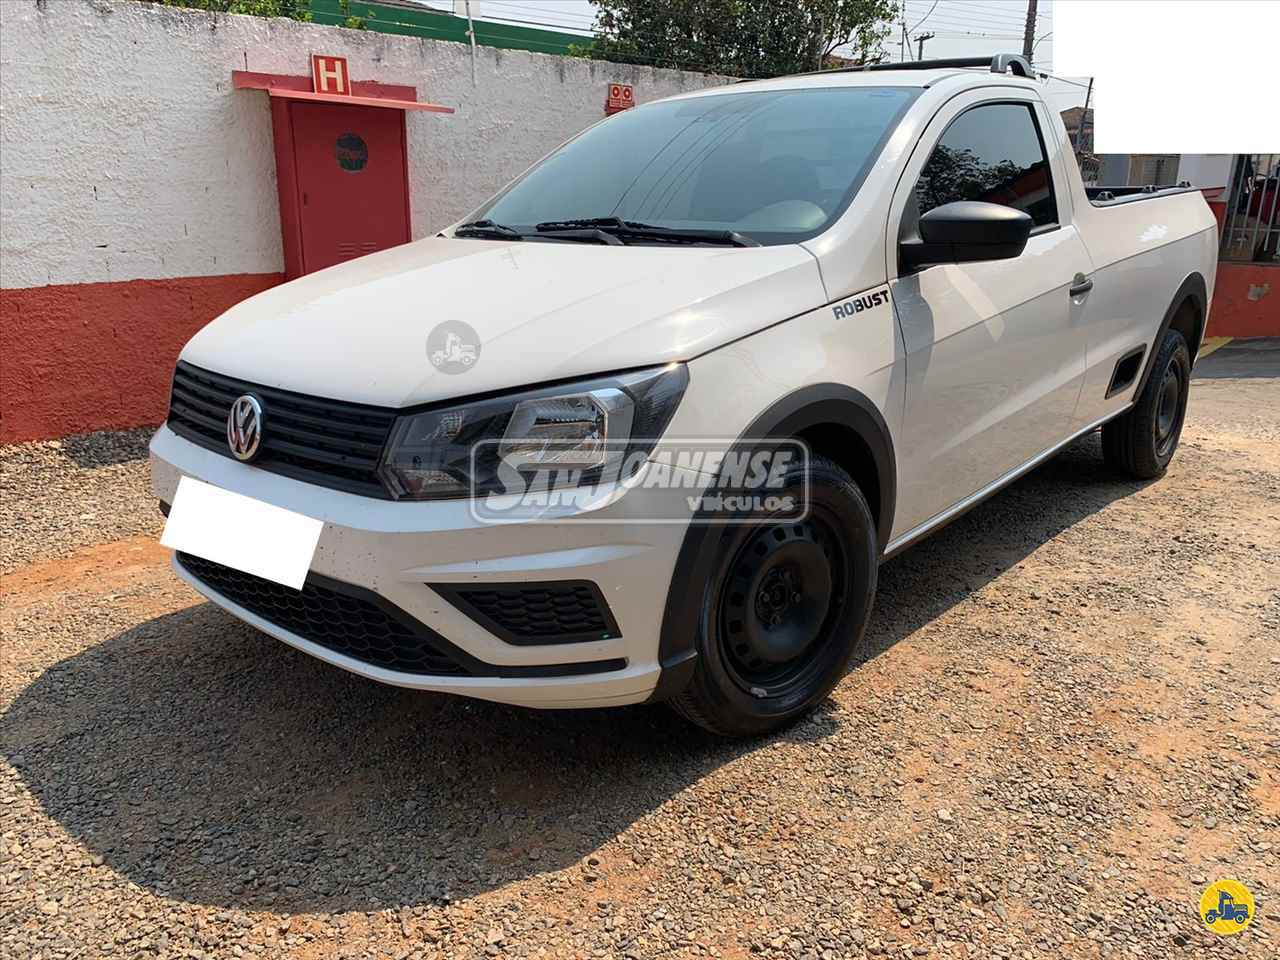 CARRO VW - Volkswagen Saveiro 1.6 Robust Sanjoanense Veículos SAO JOAO DA BOA VISTA SÃO PAULO SP